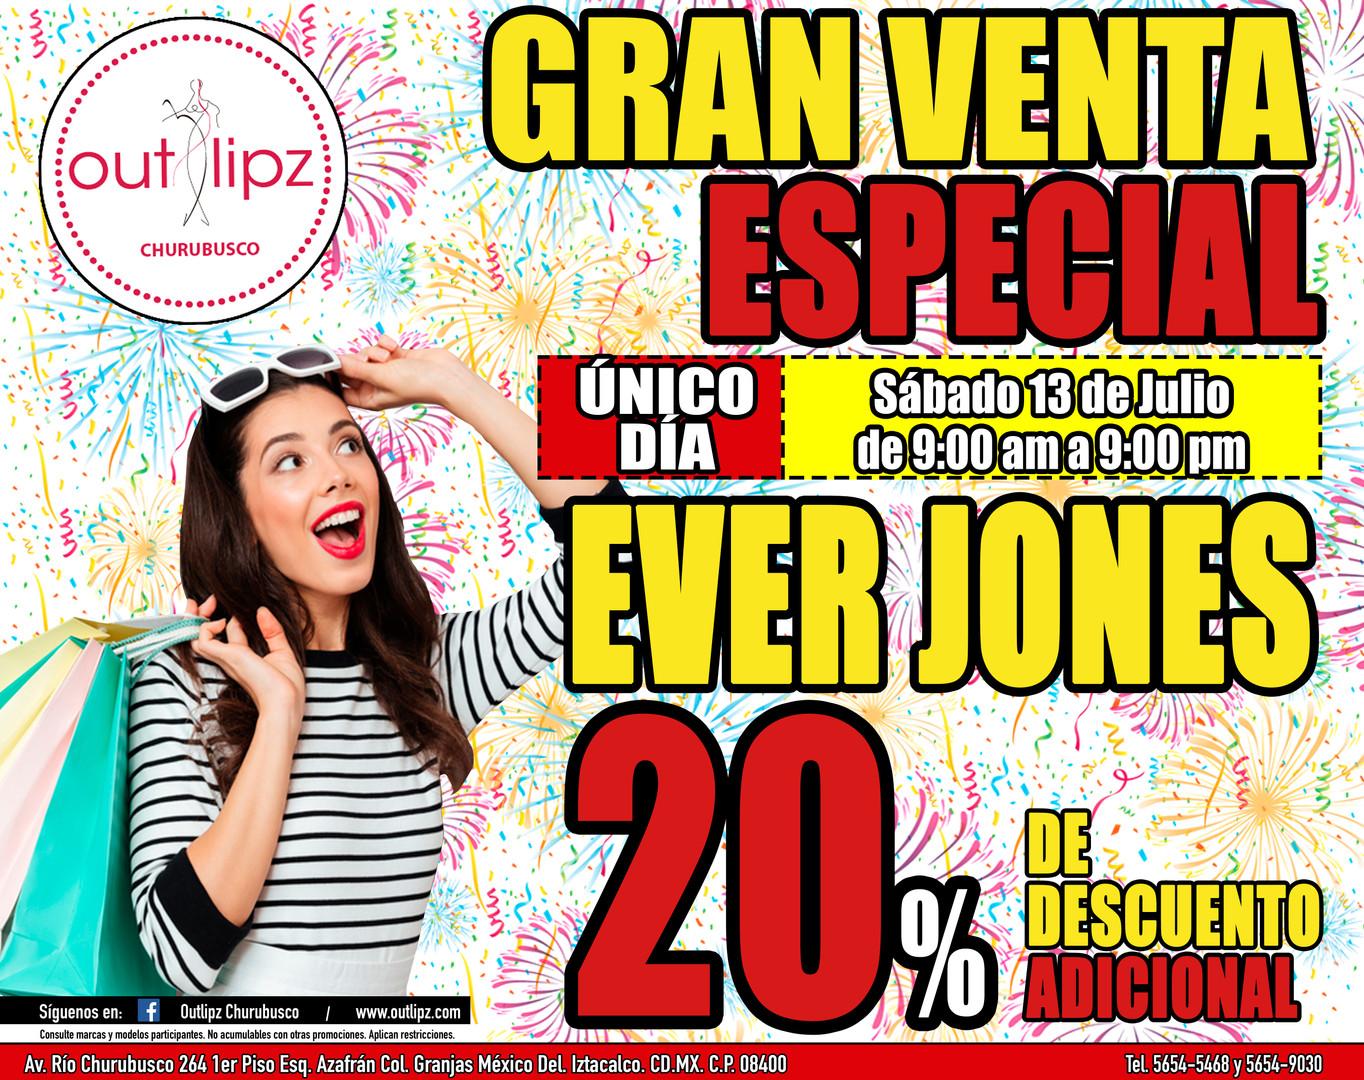 GVE 2 Ever Jones.jpg